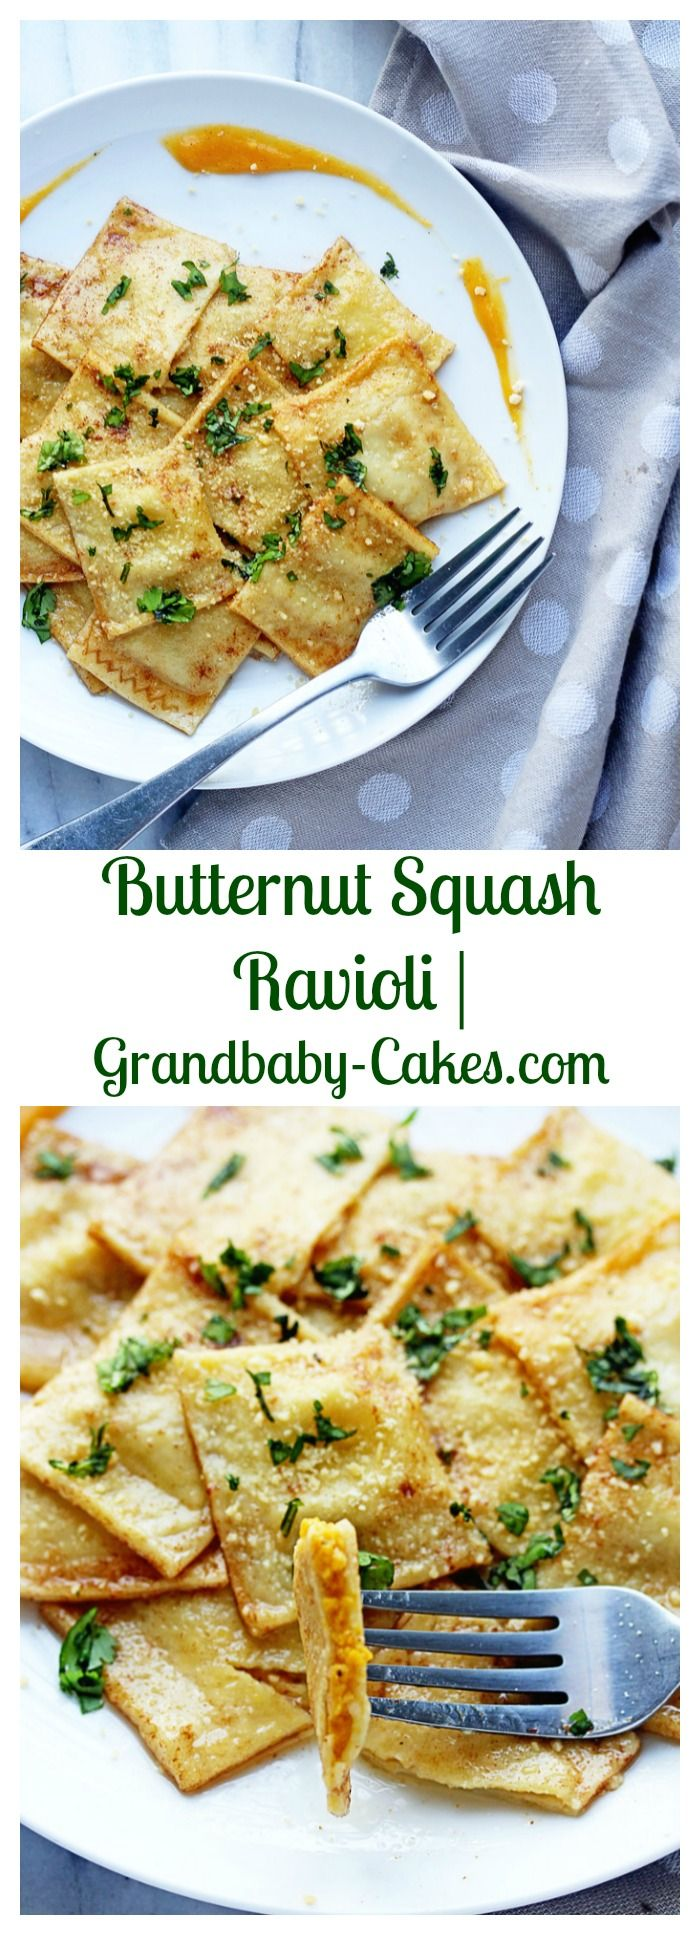 Butternut Squash Ravioli   Grandbaby-Cakes.com